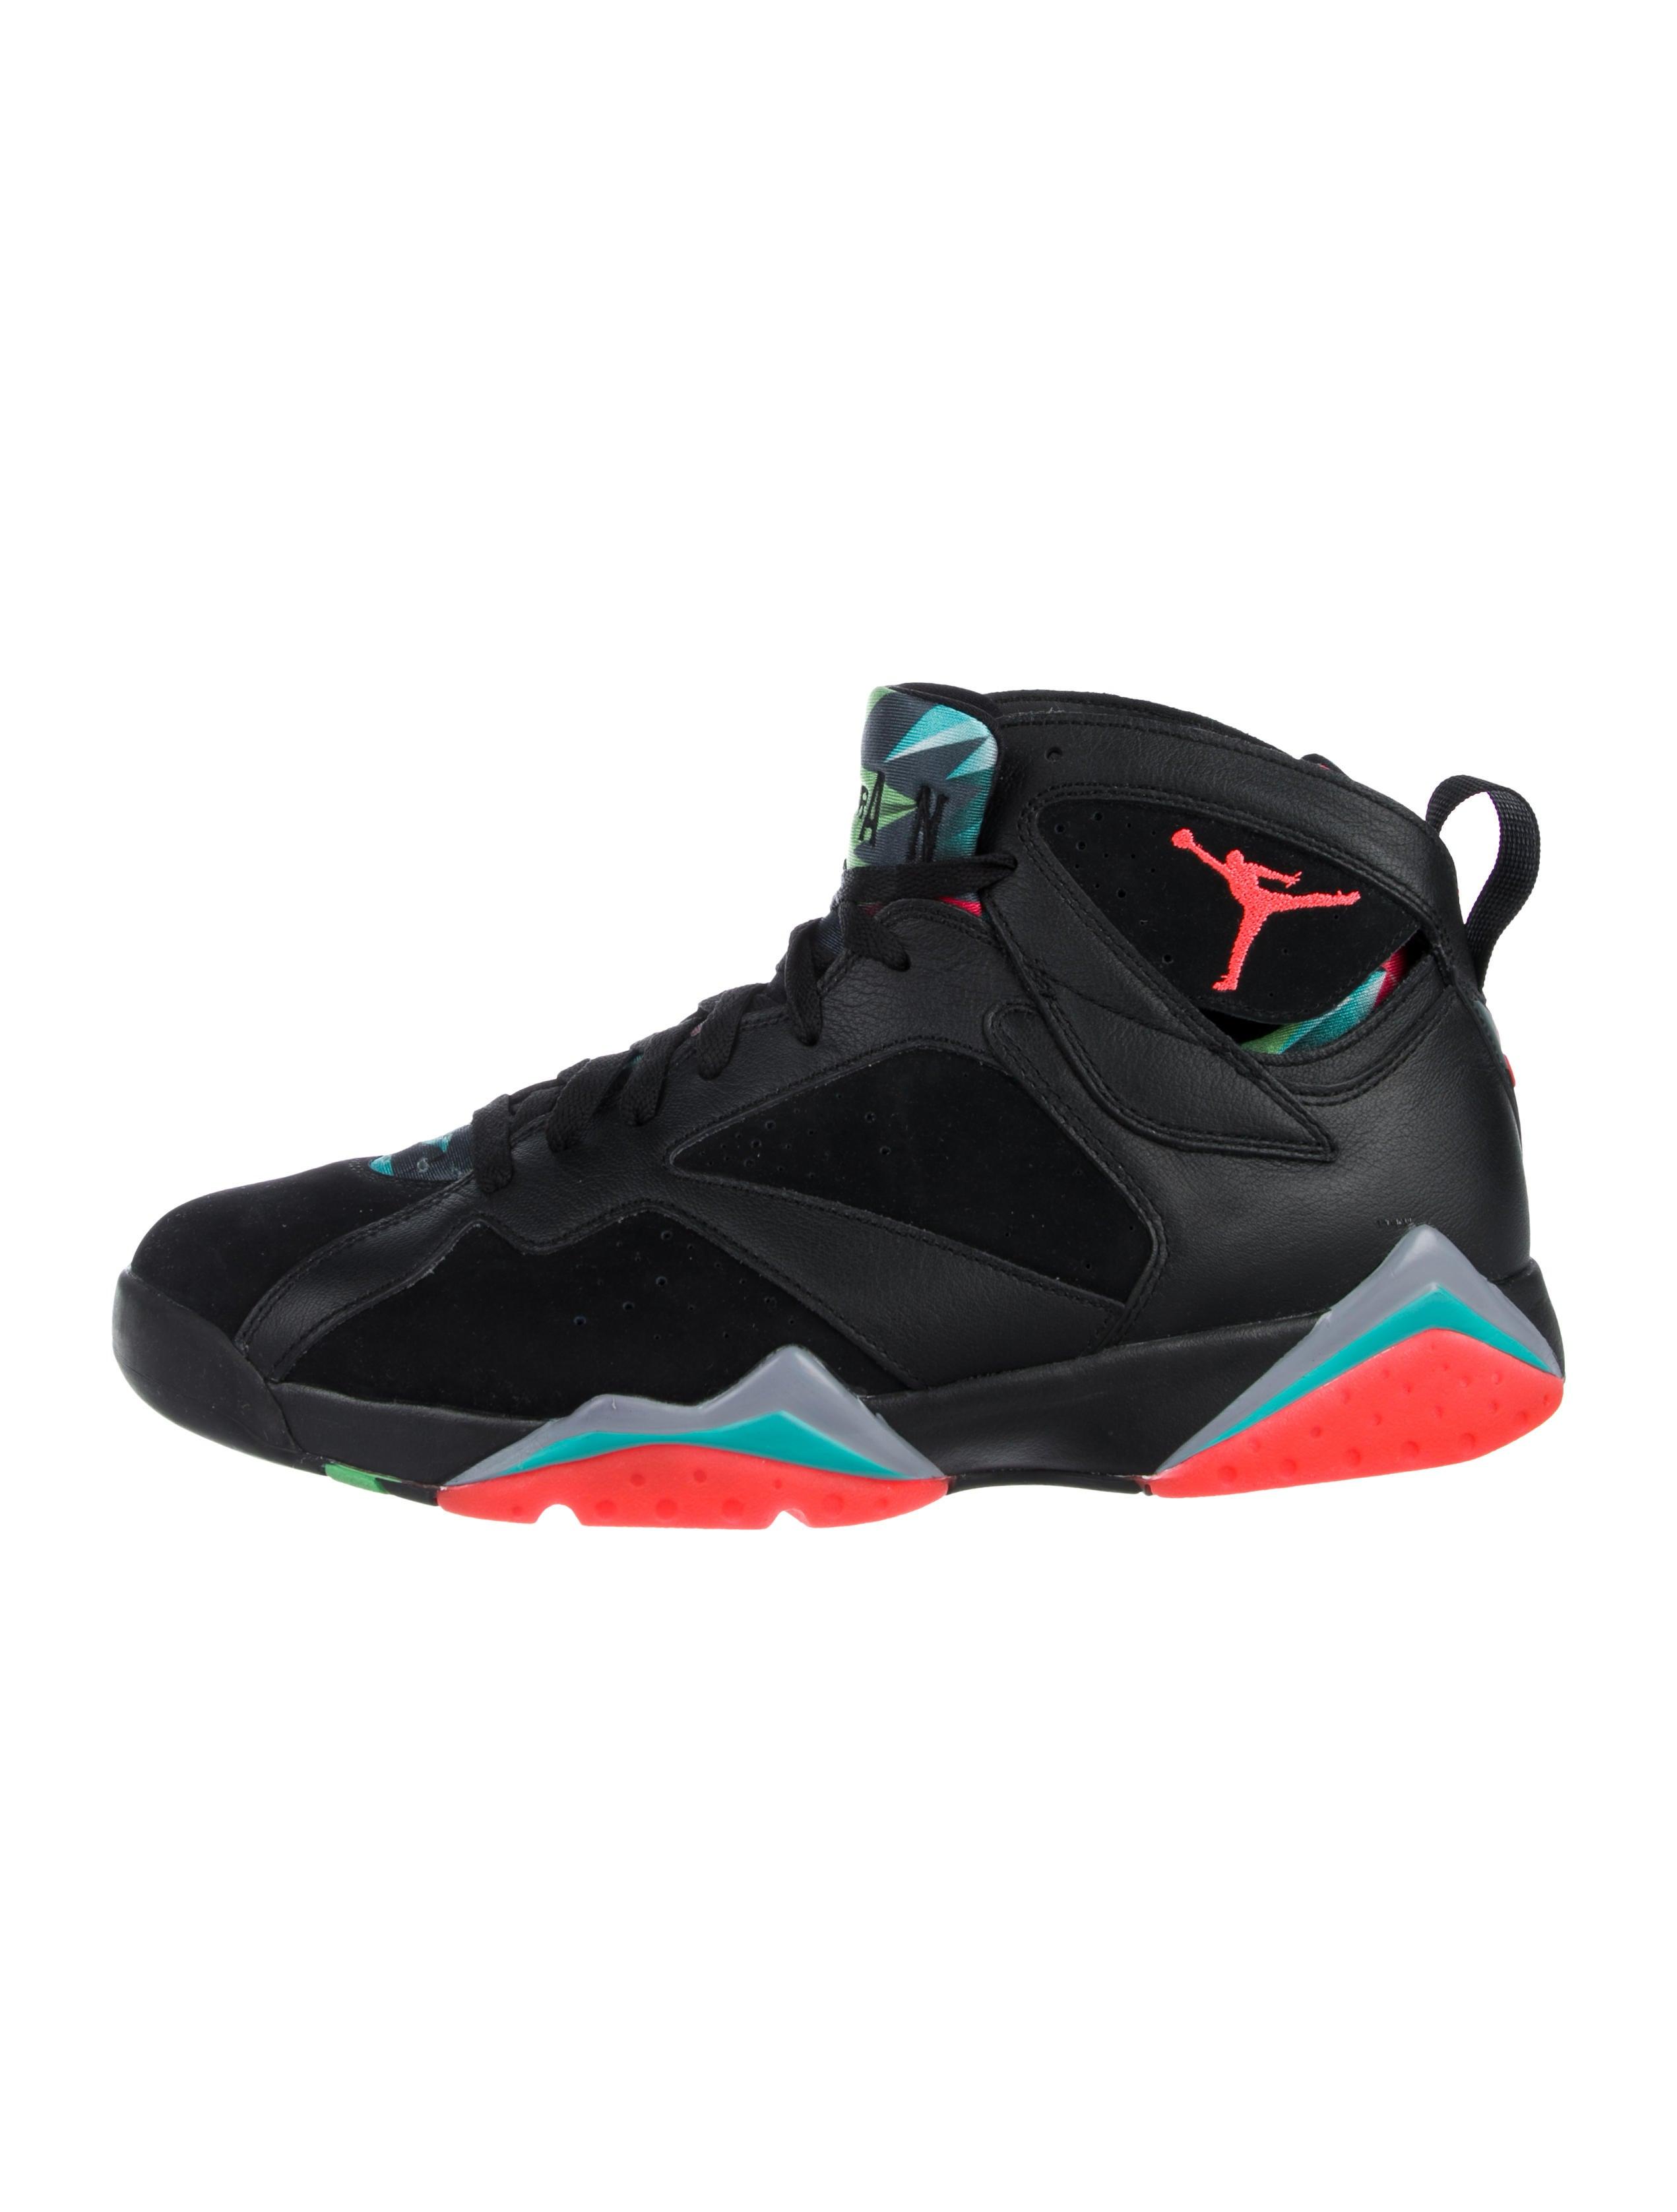 newest 3c7e5 c8170 Nike Air Jordan 7 Retro 30th Barcelona Nights Sneakers - Shoes ...